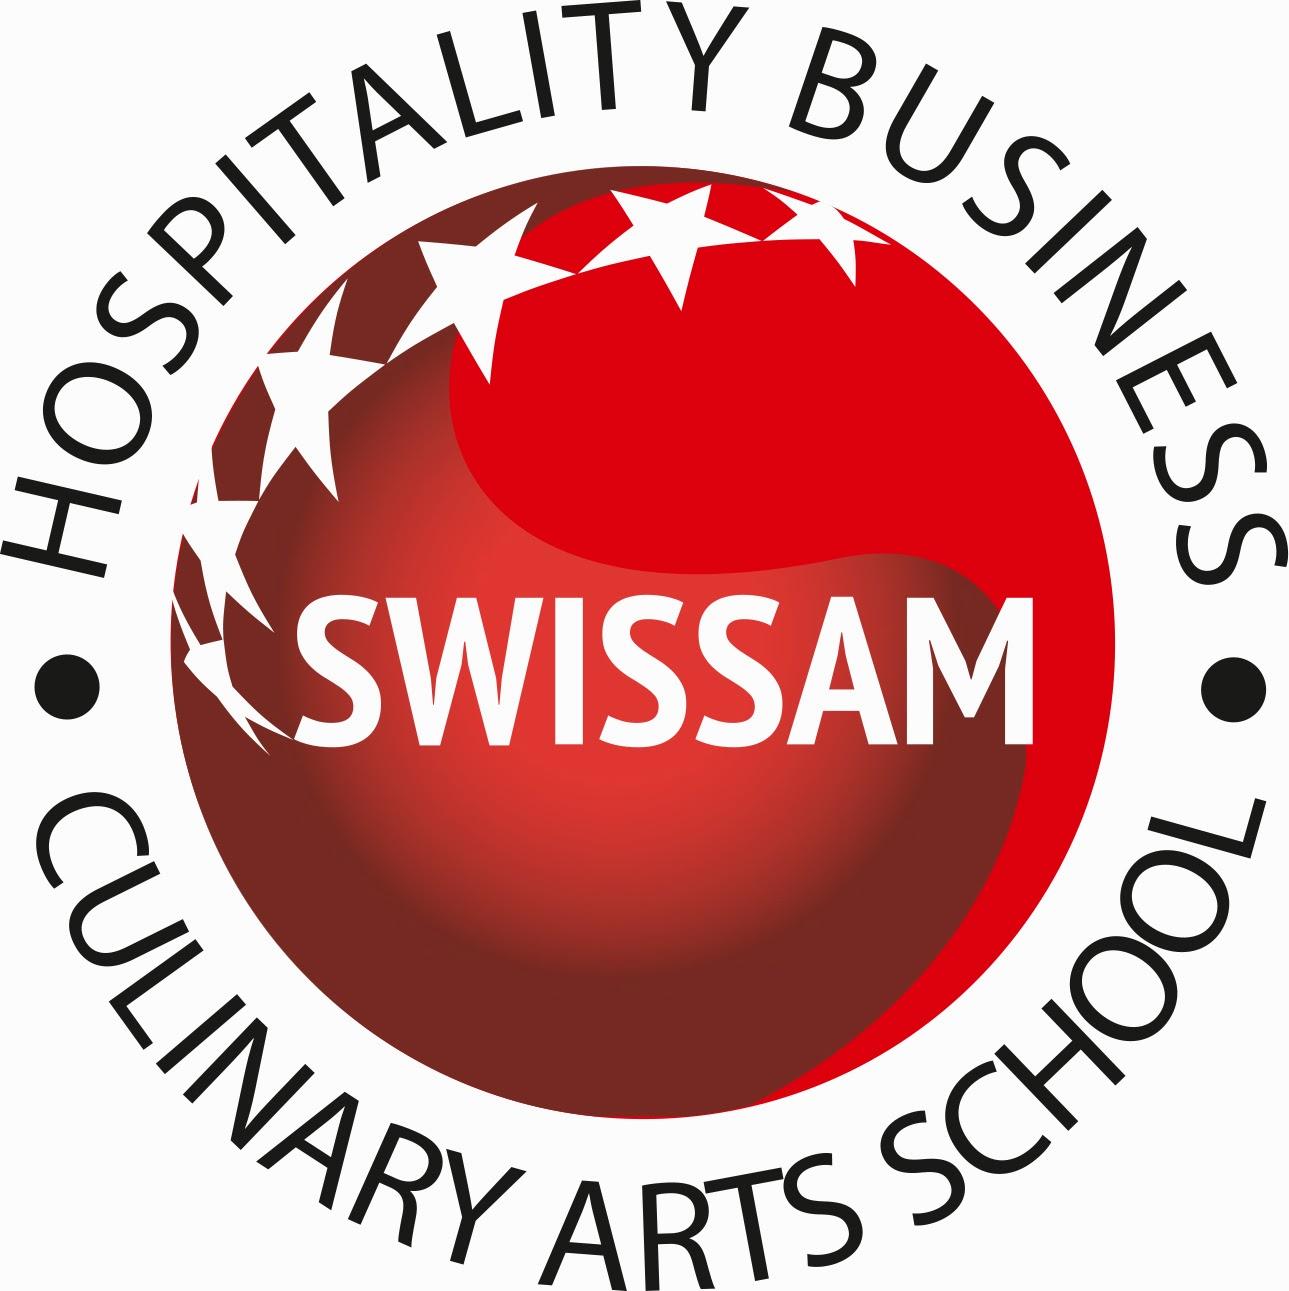 Hospitality Business & Culinary Arts School SWISSM